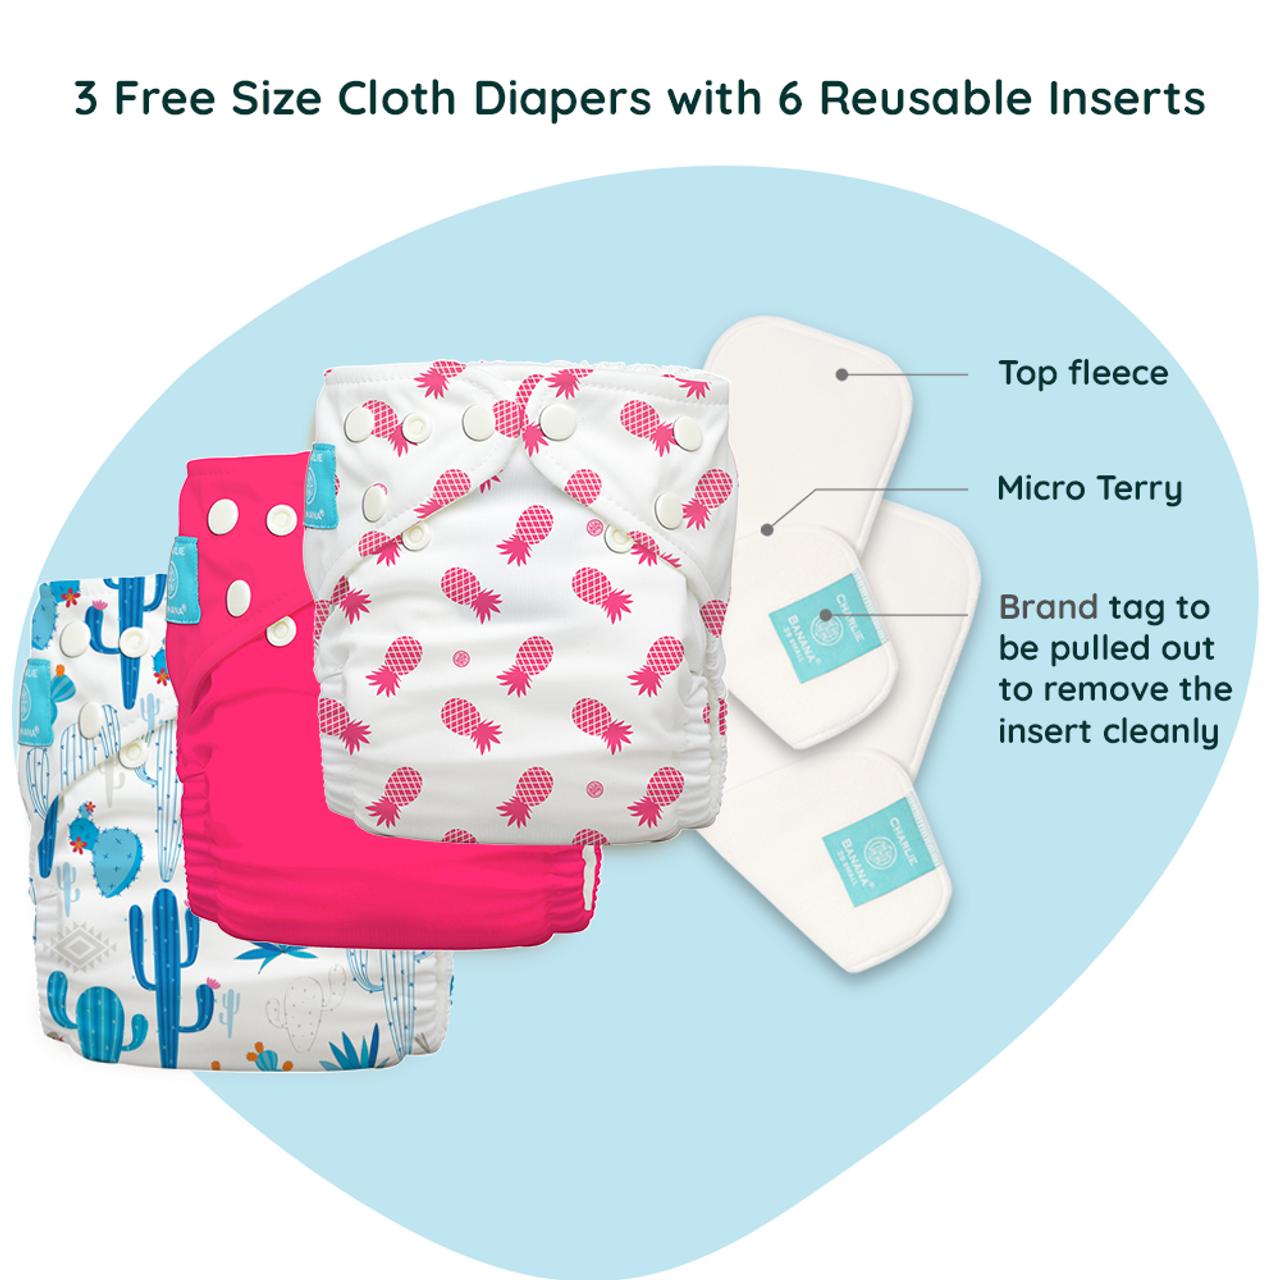 Free Size Cloth Diaper - Super Saver Pack of 3 | Pina Colada